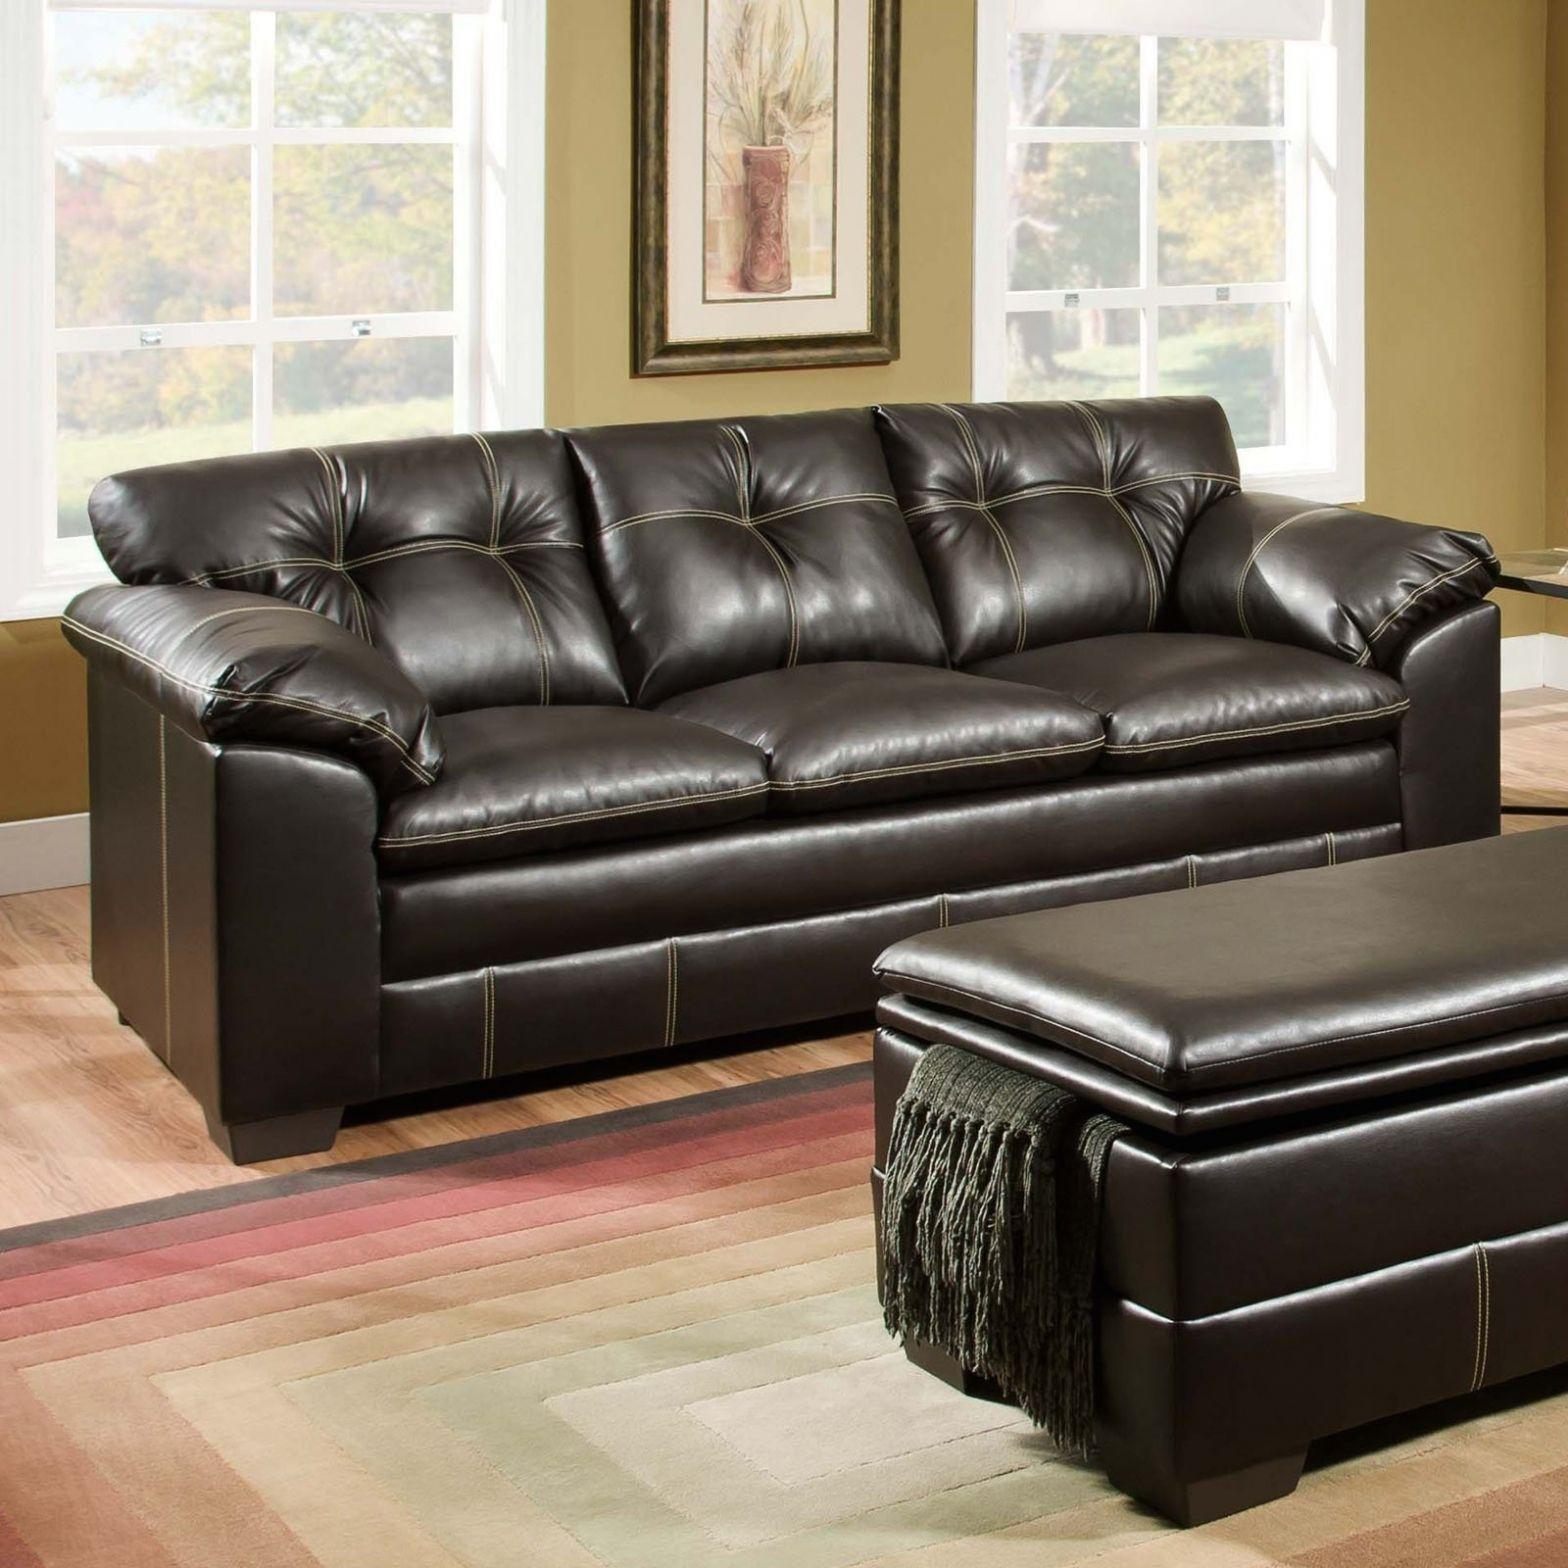 Big Lots Sectional Sofa With Recliner di 2020